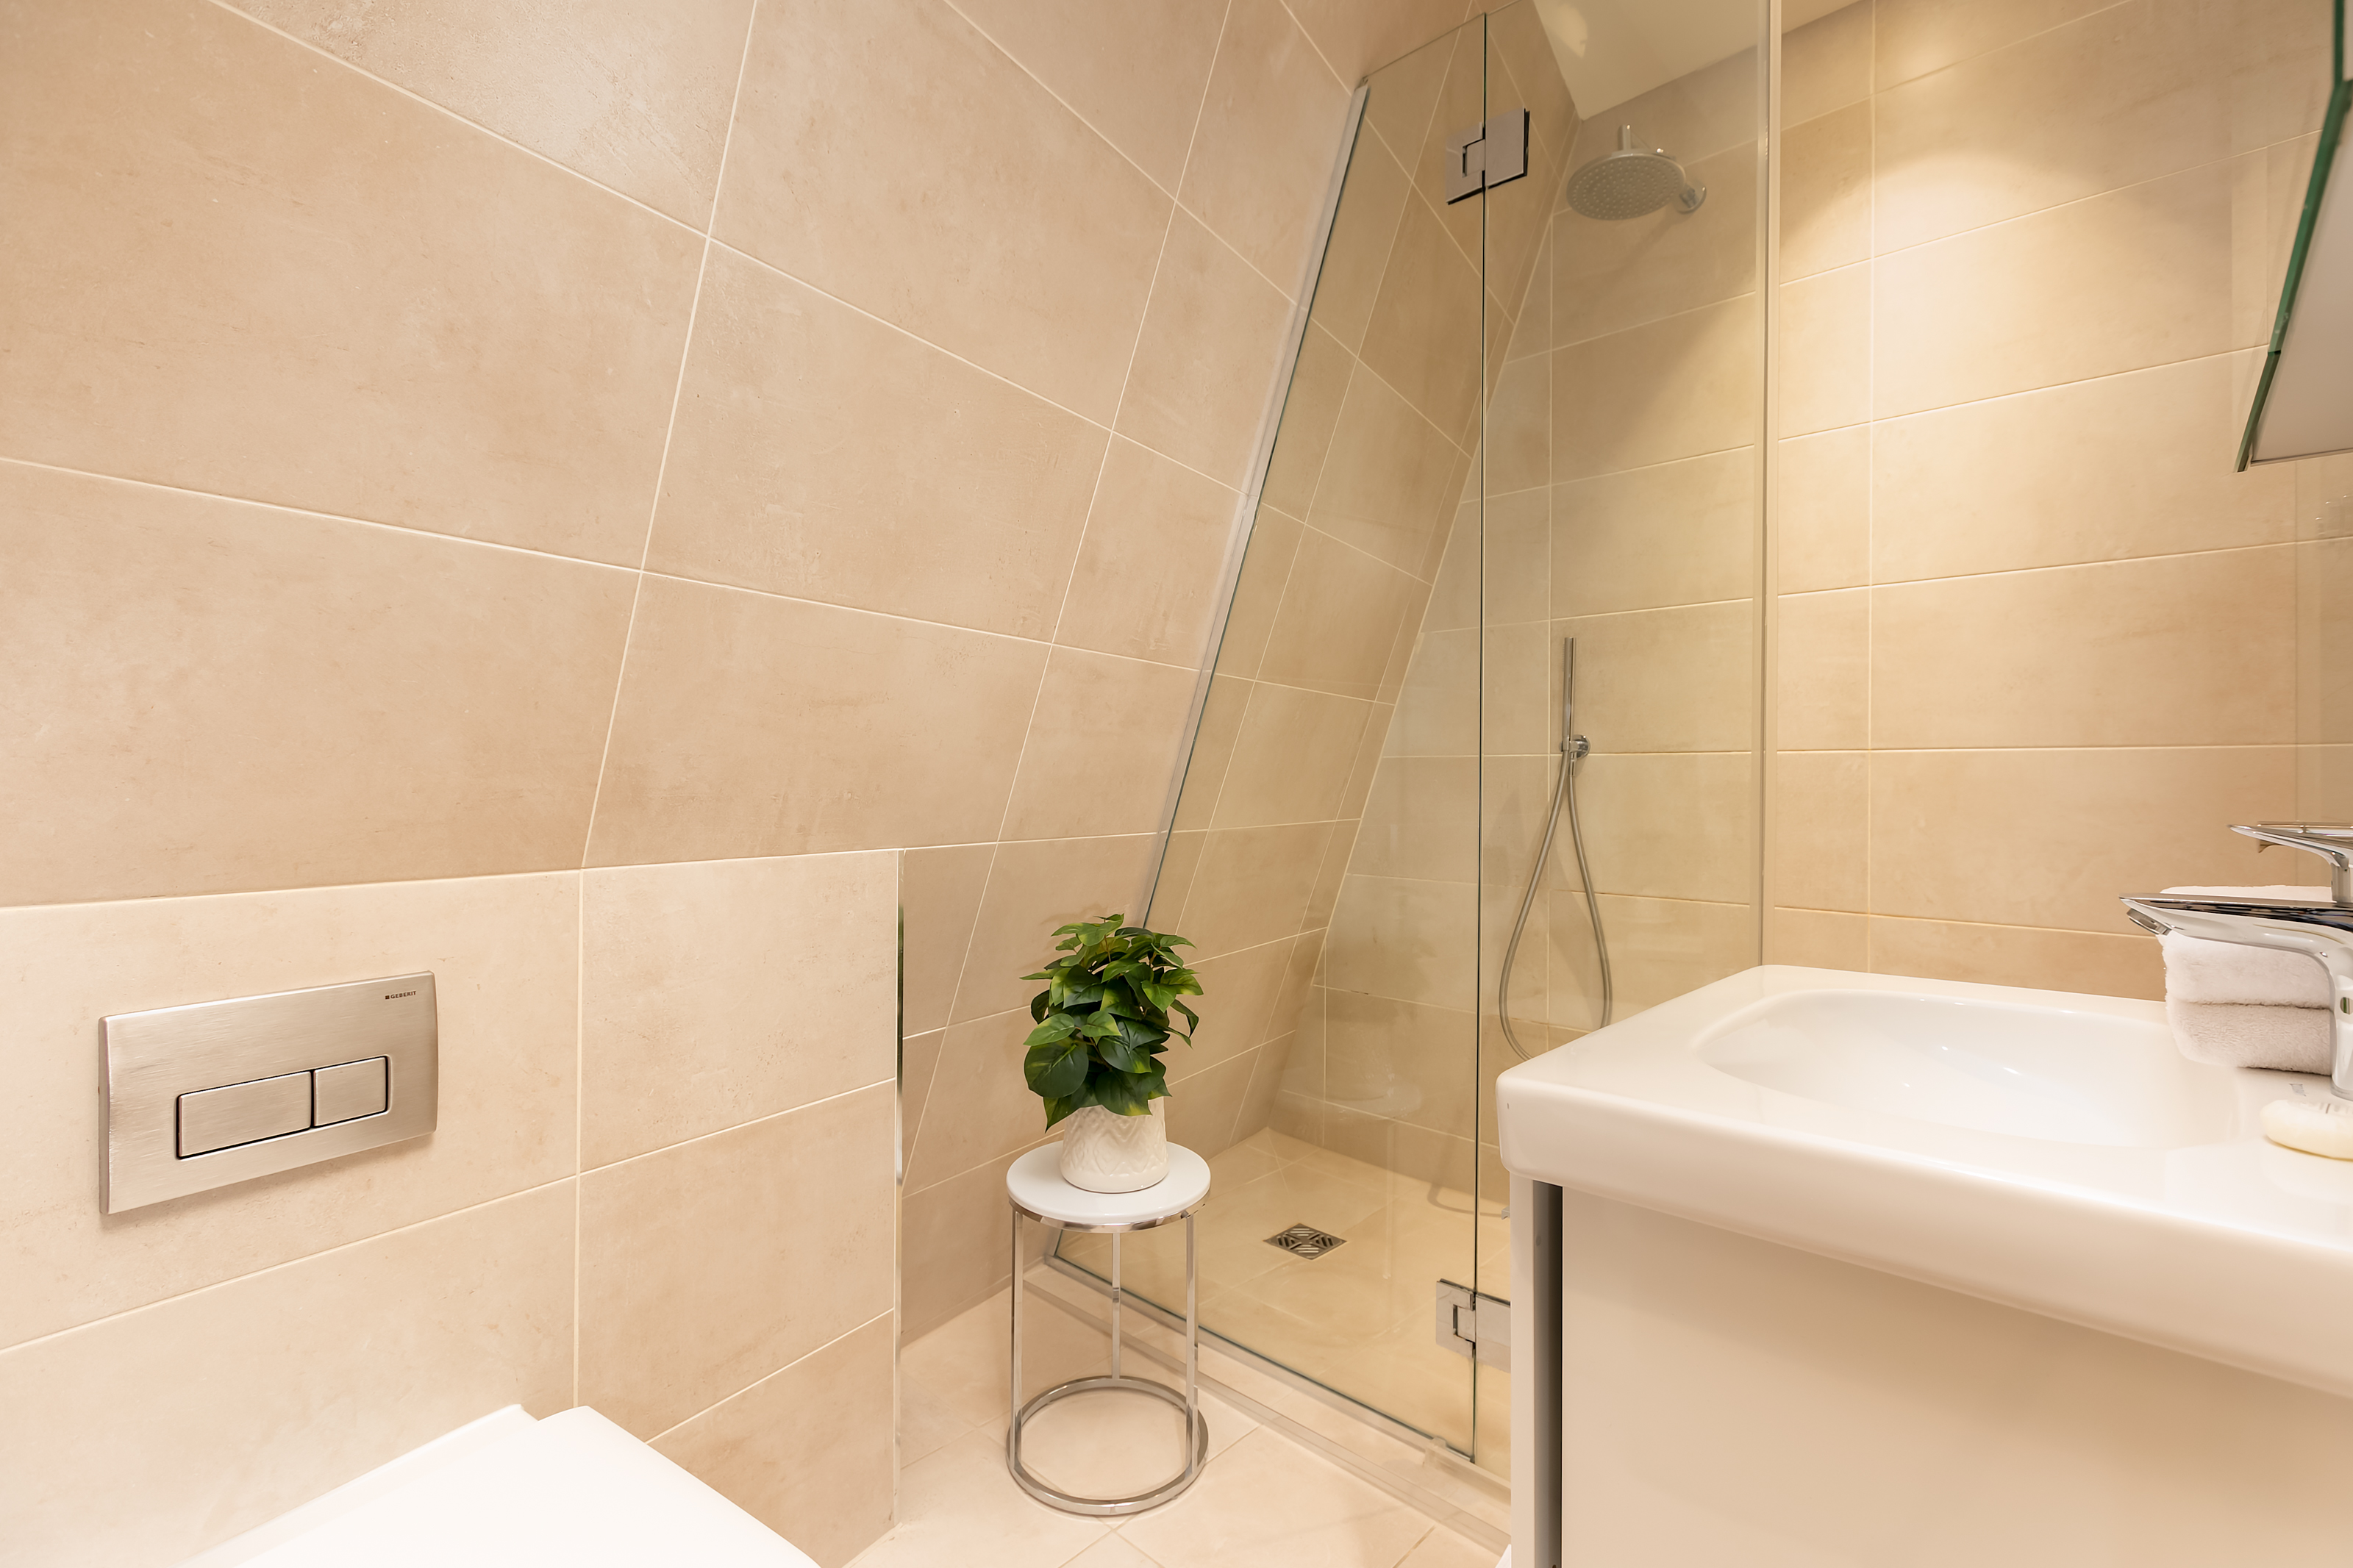 Lovelydays luxury service apartment rental - London - Fitzrovia - Wells Mews A - Lovelysuite - 2 bedrooms - 2 bathrooms - Lovely shower - 5 star serviced apartments in london - 1a25bc64139d - Lovelydays